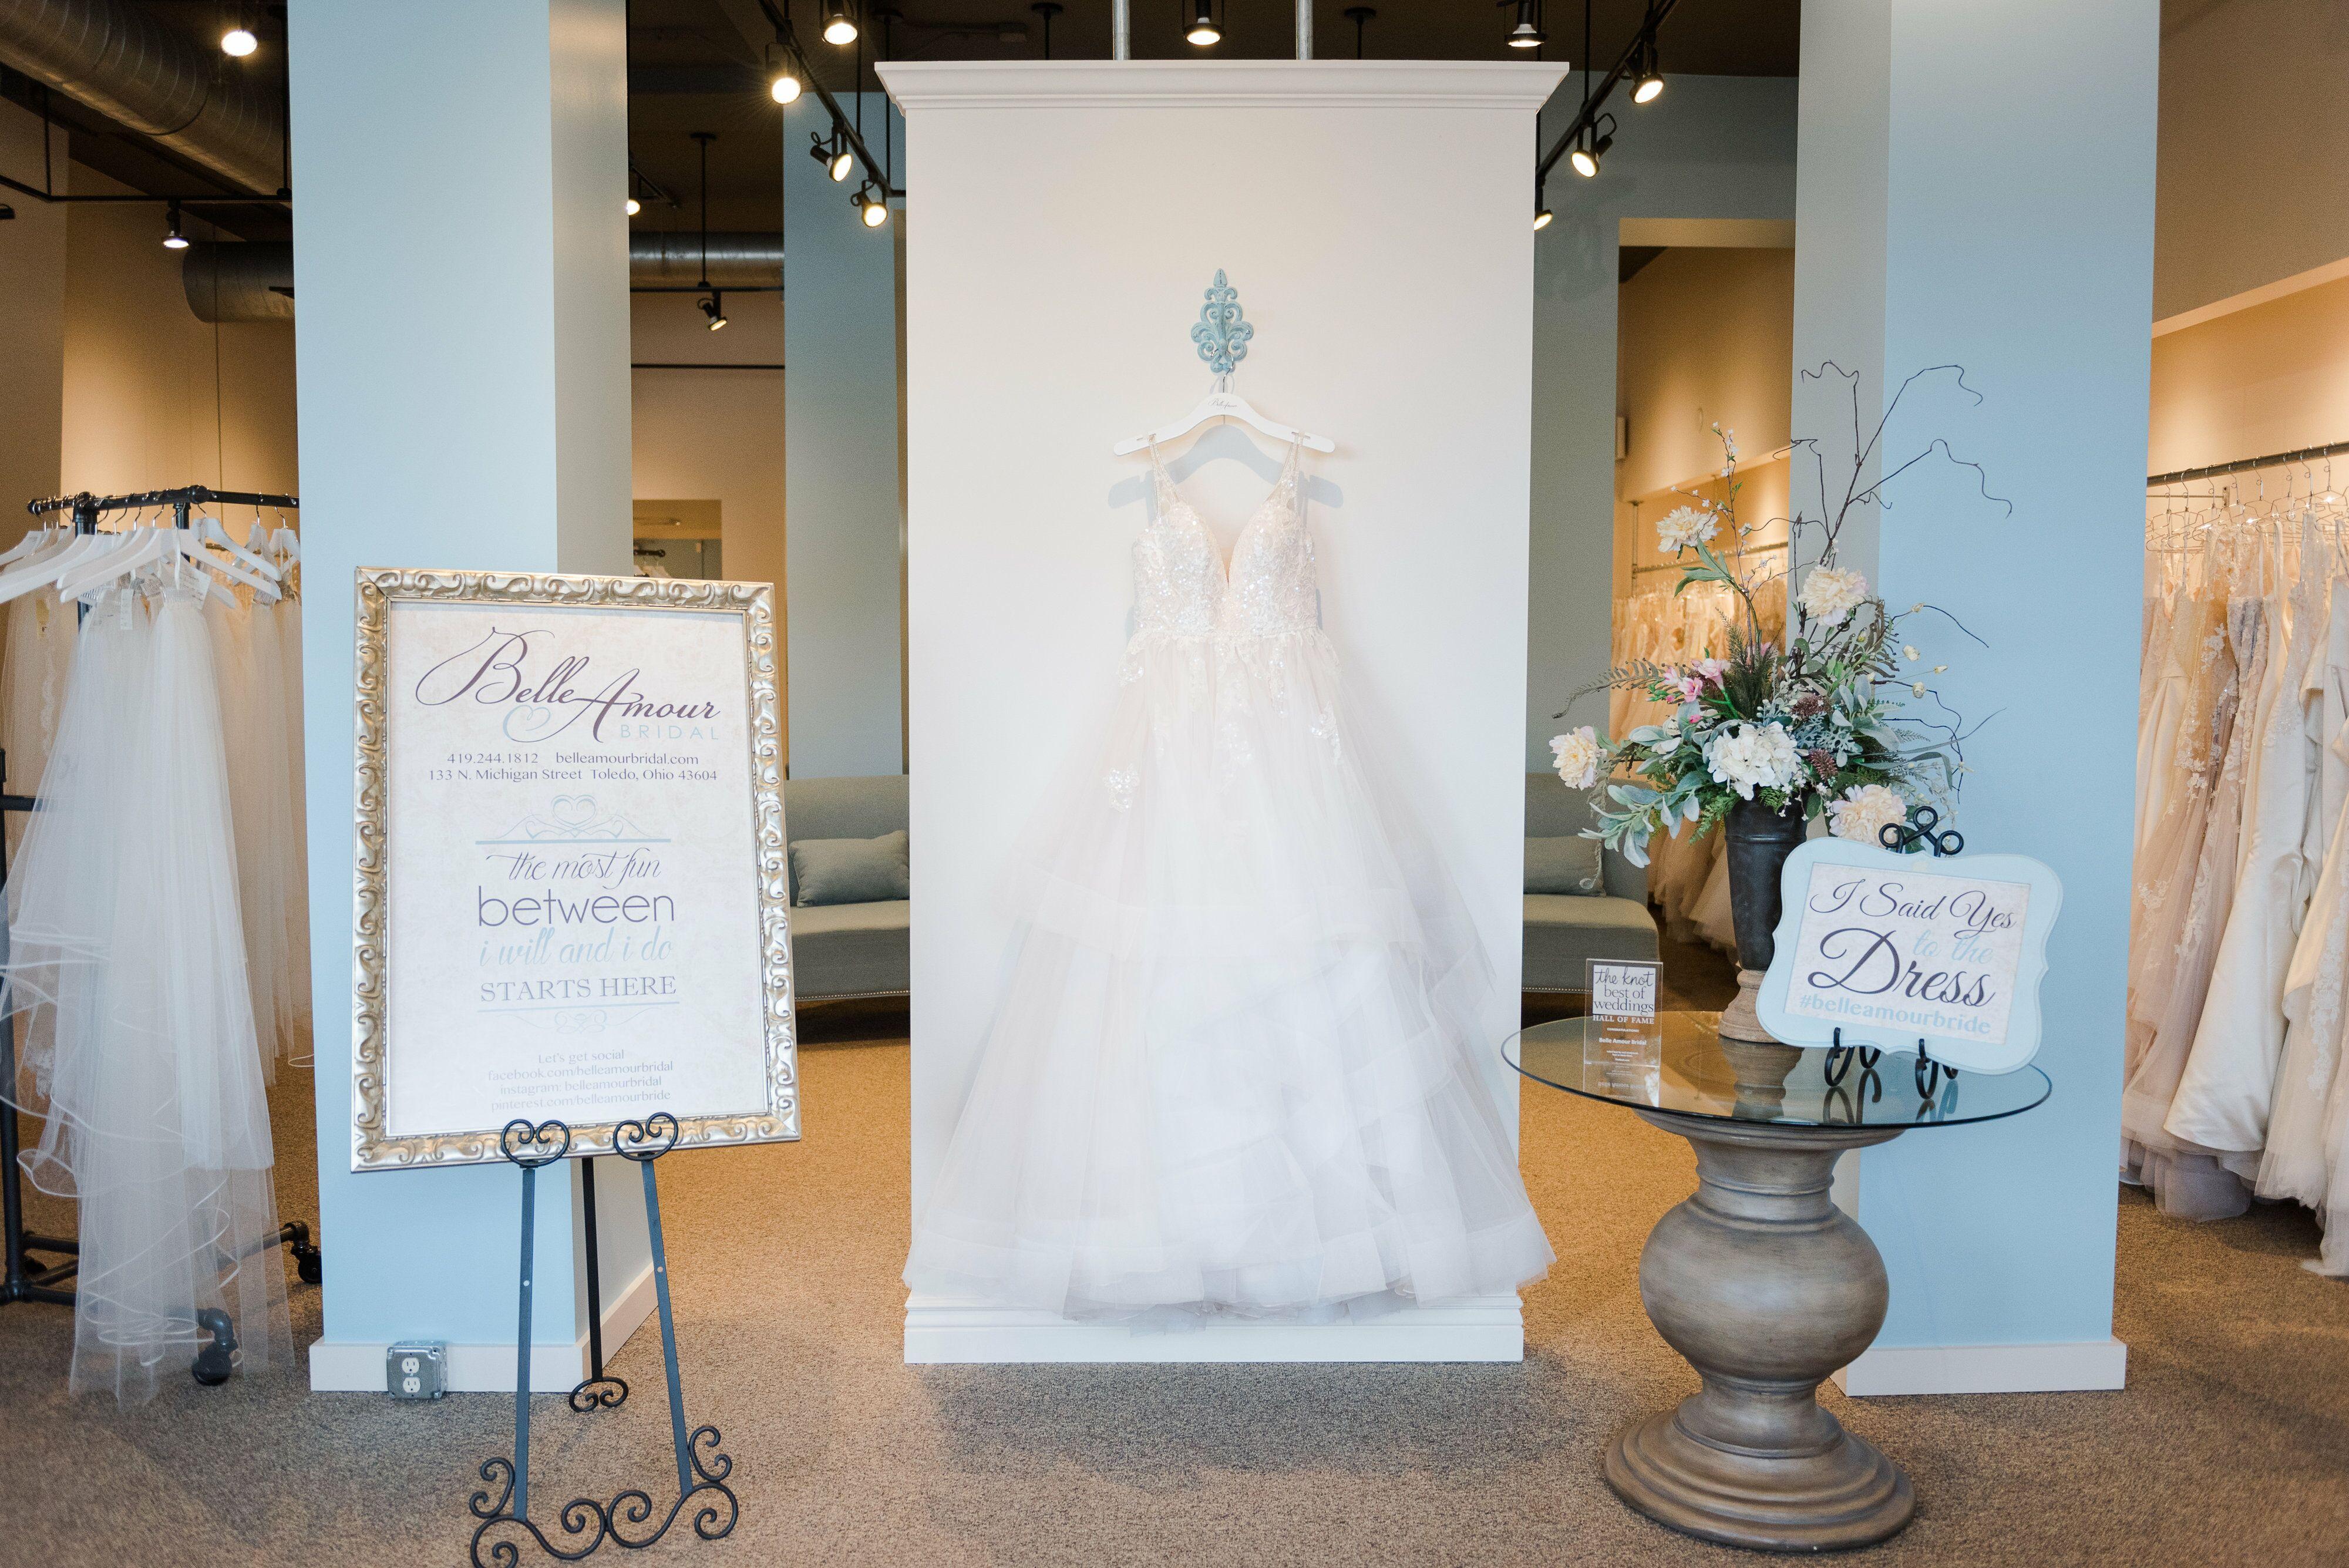 Belle Amour Bridal Bridal Salons Toledo Oh